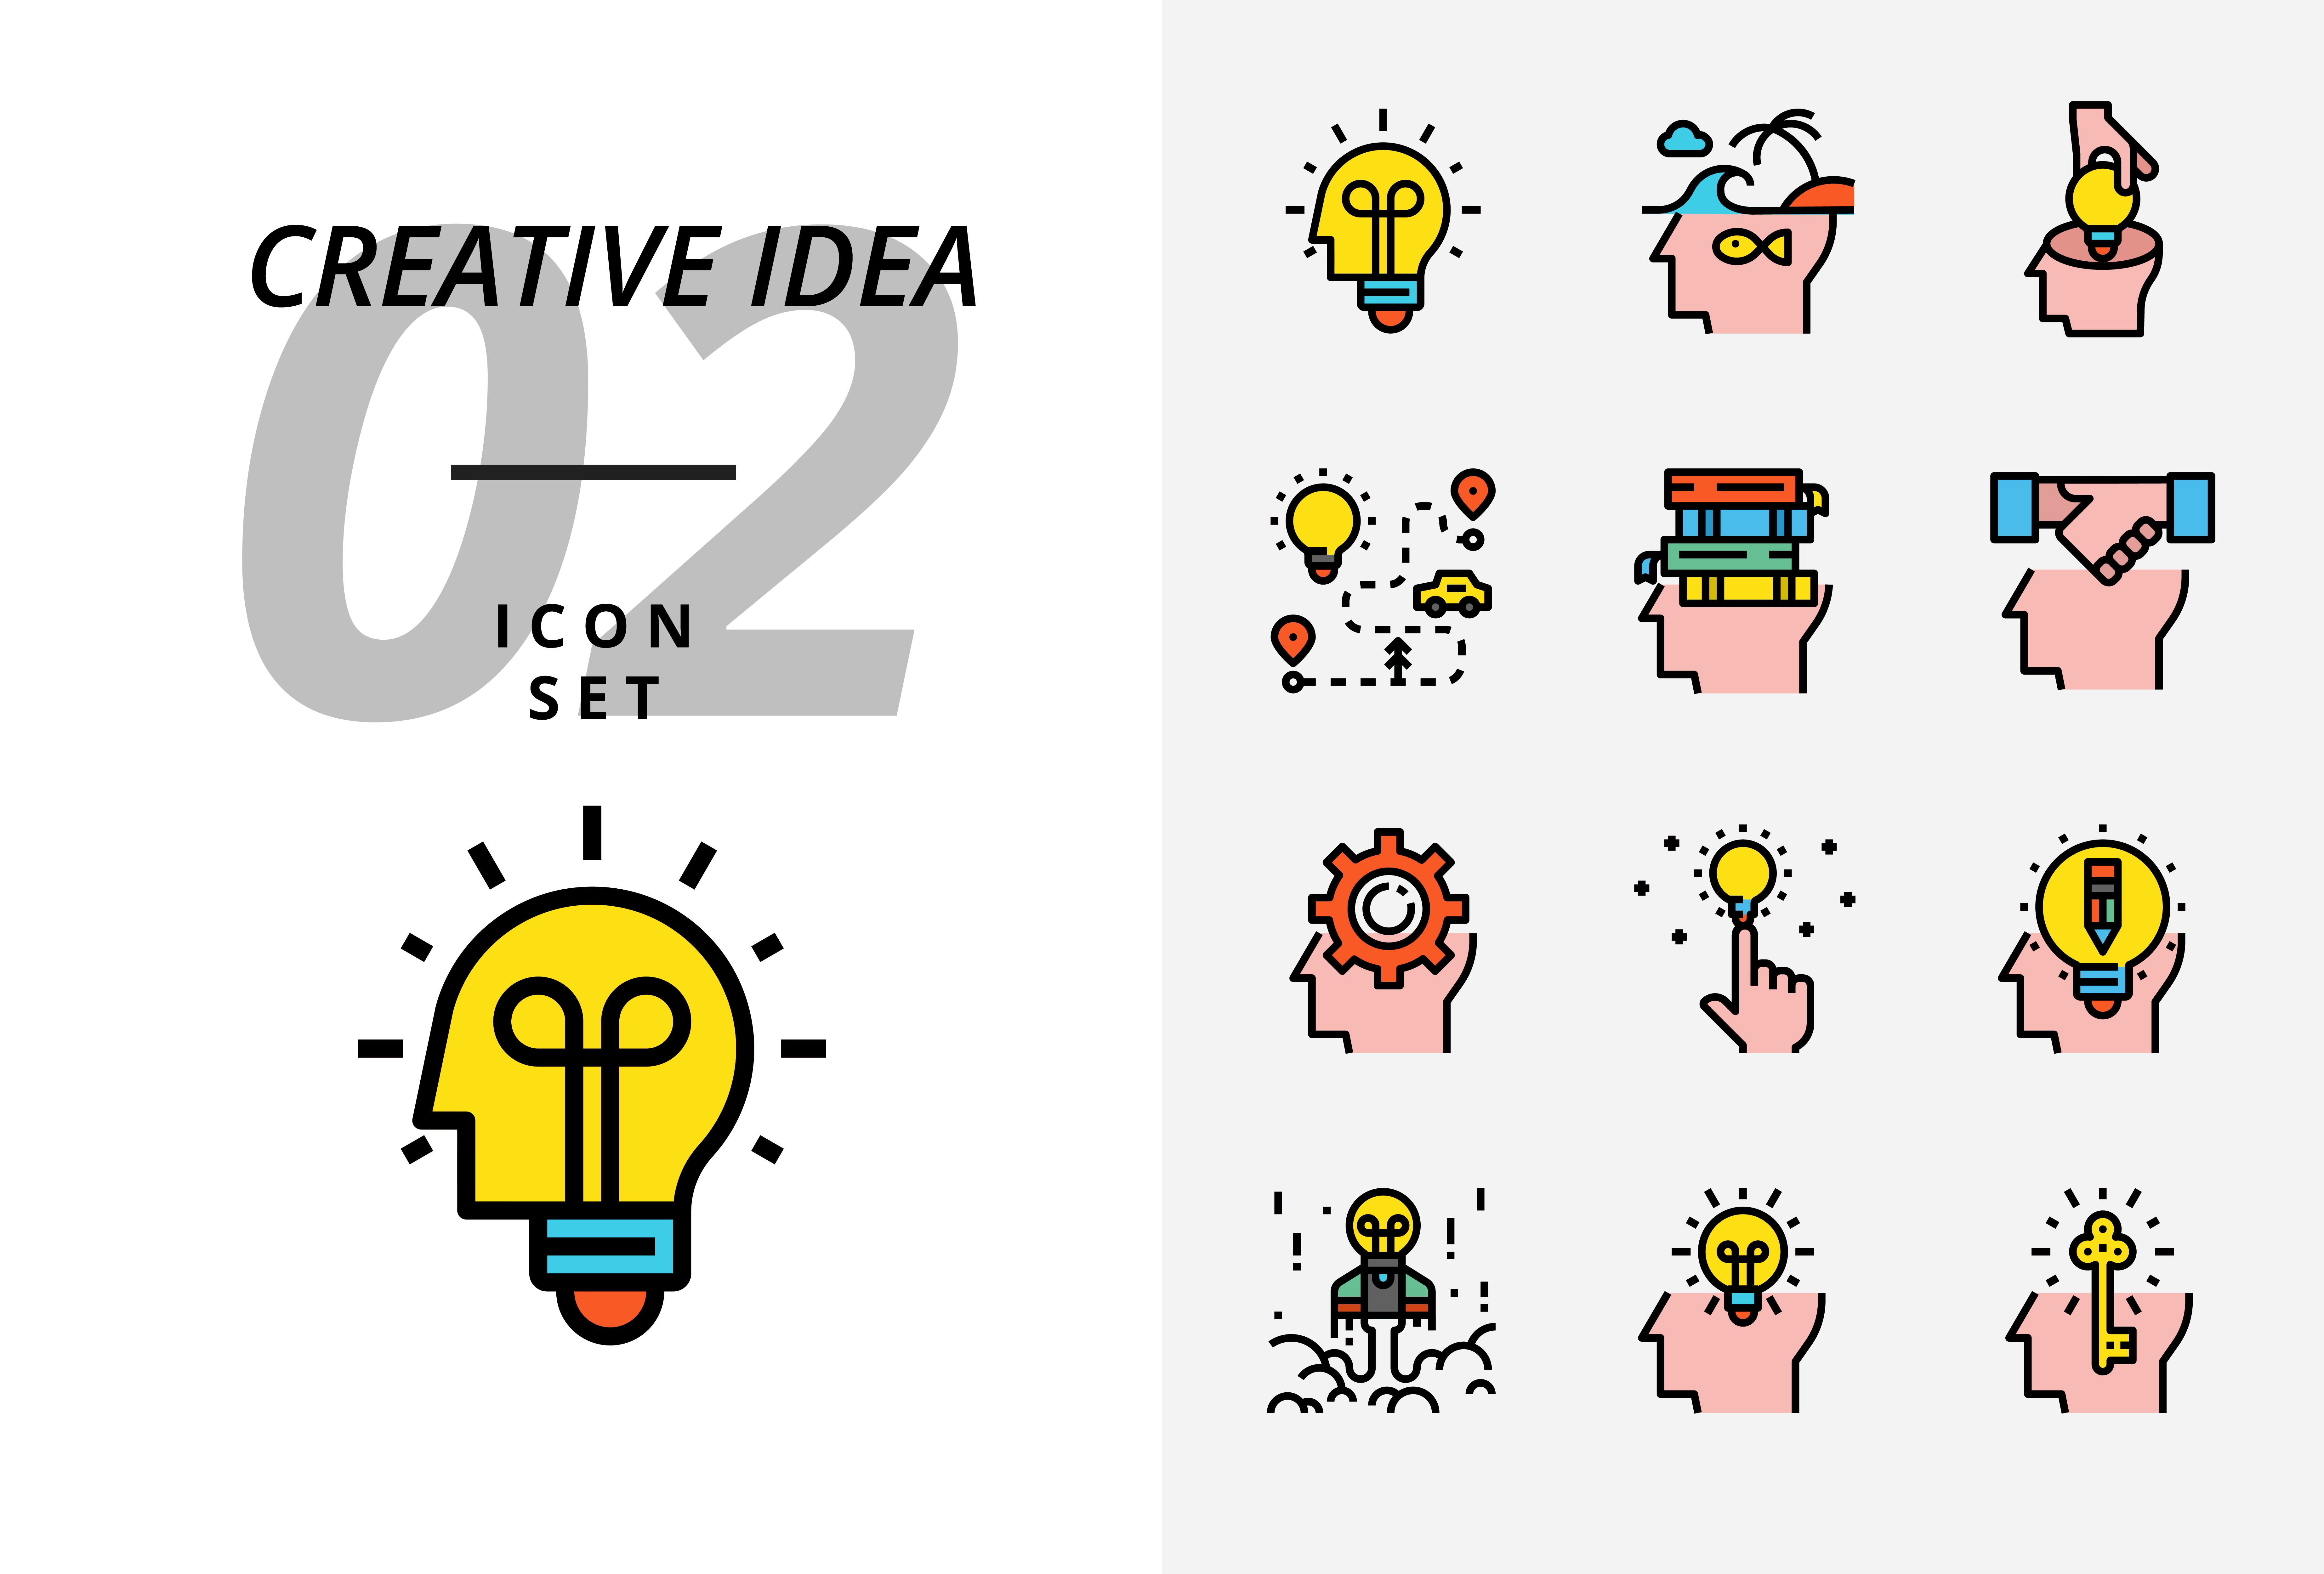 icon pack for creative idea  brainstorm  idea  creative